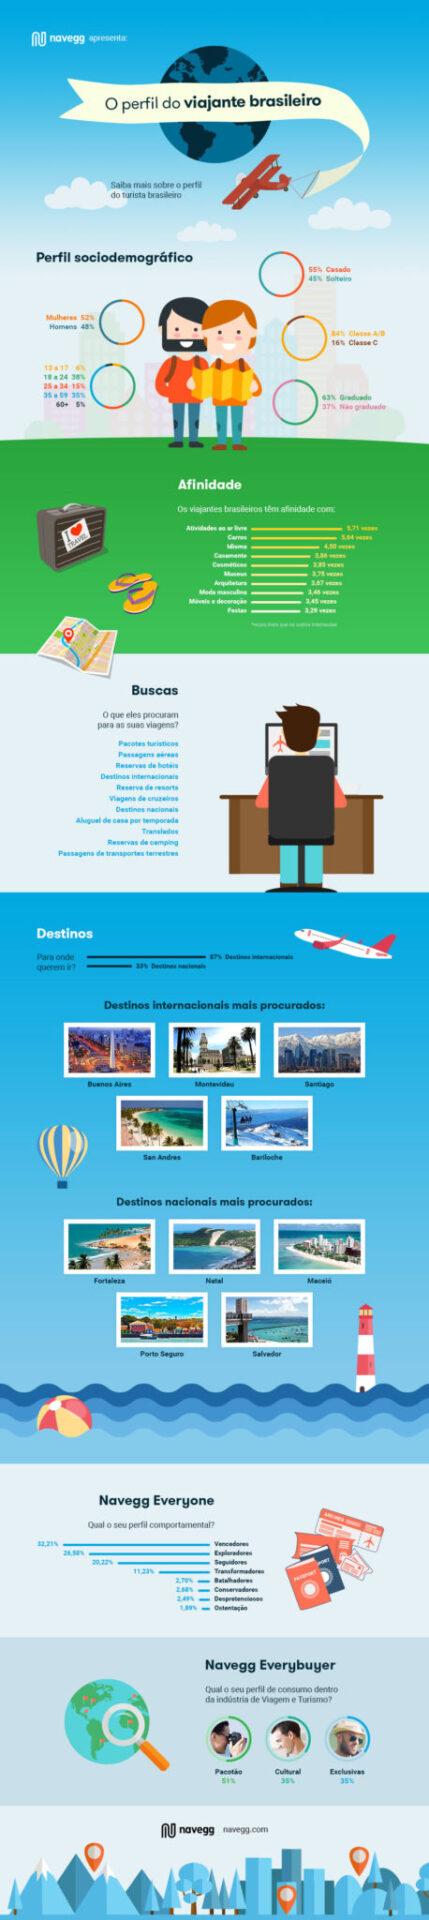 navegg-o-perfil-do-viajante-brasileiro (1)